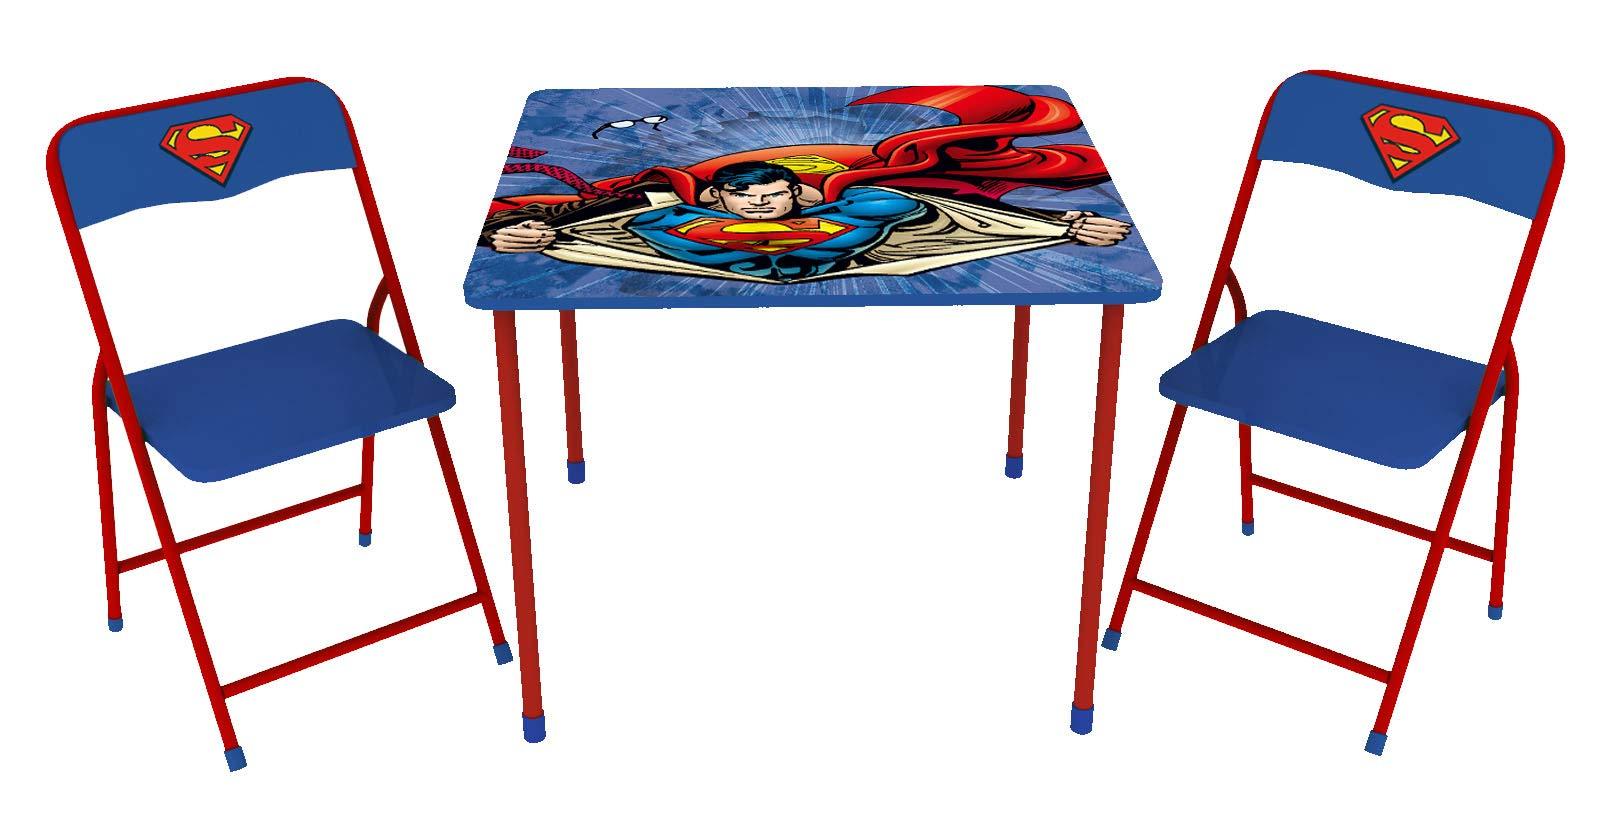 O'KIDS,INC. Superman Children's Metal Table & Chair 3Piece Set by O'KIDS,INC.